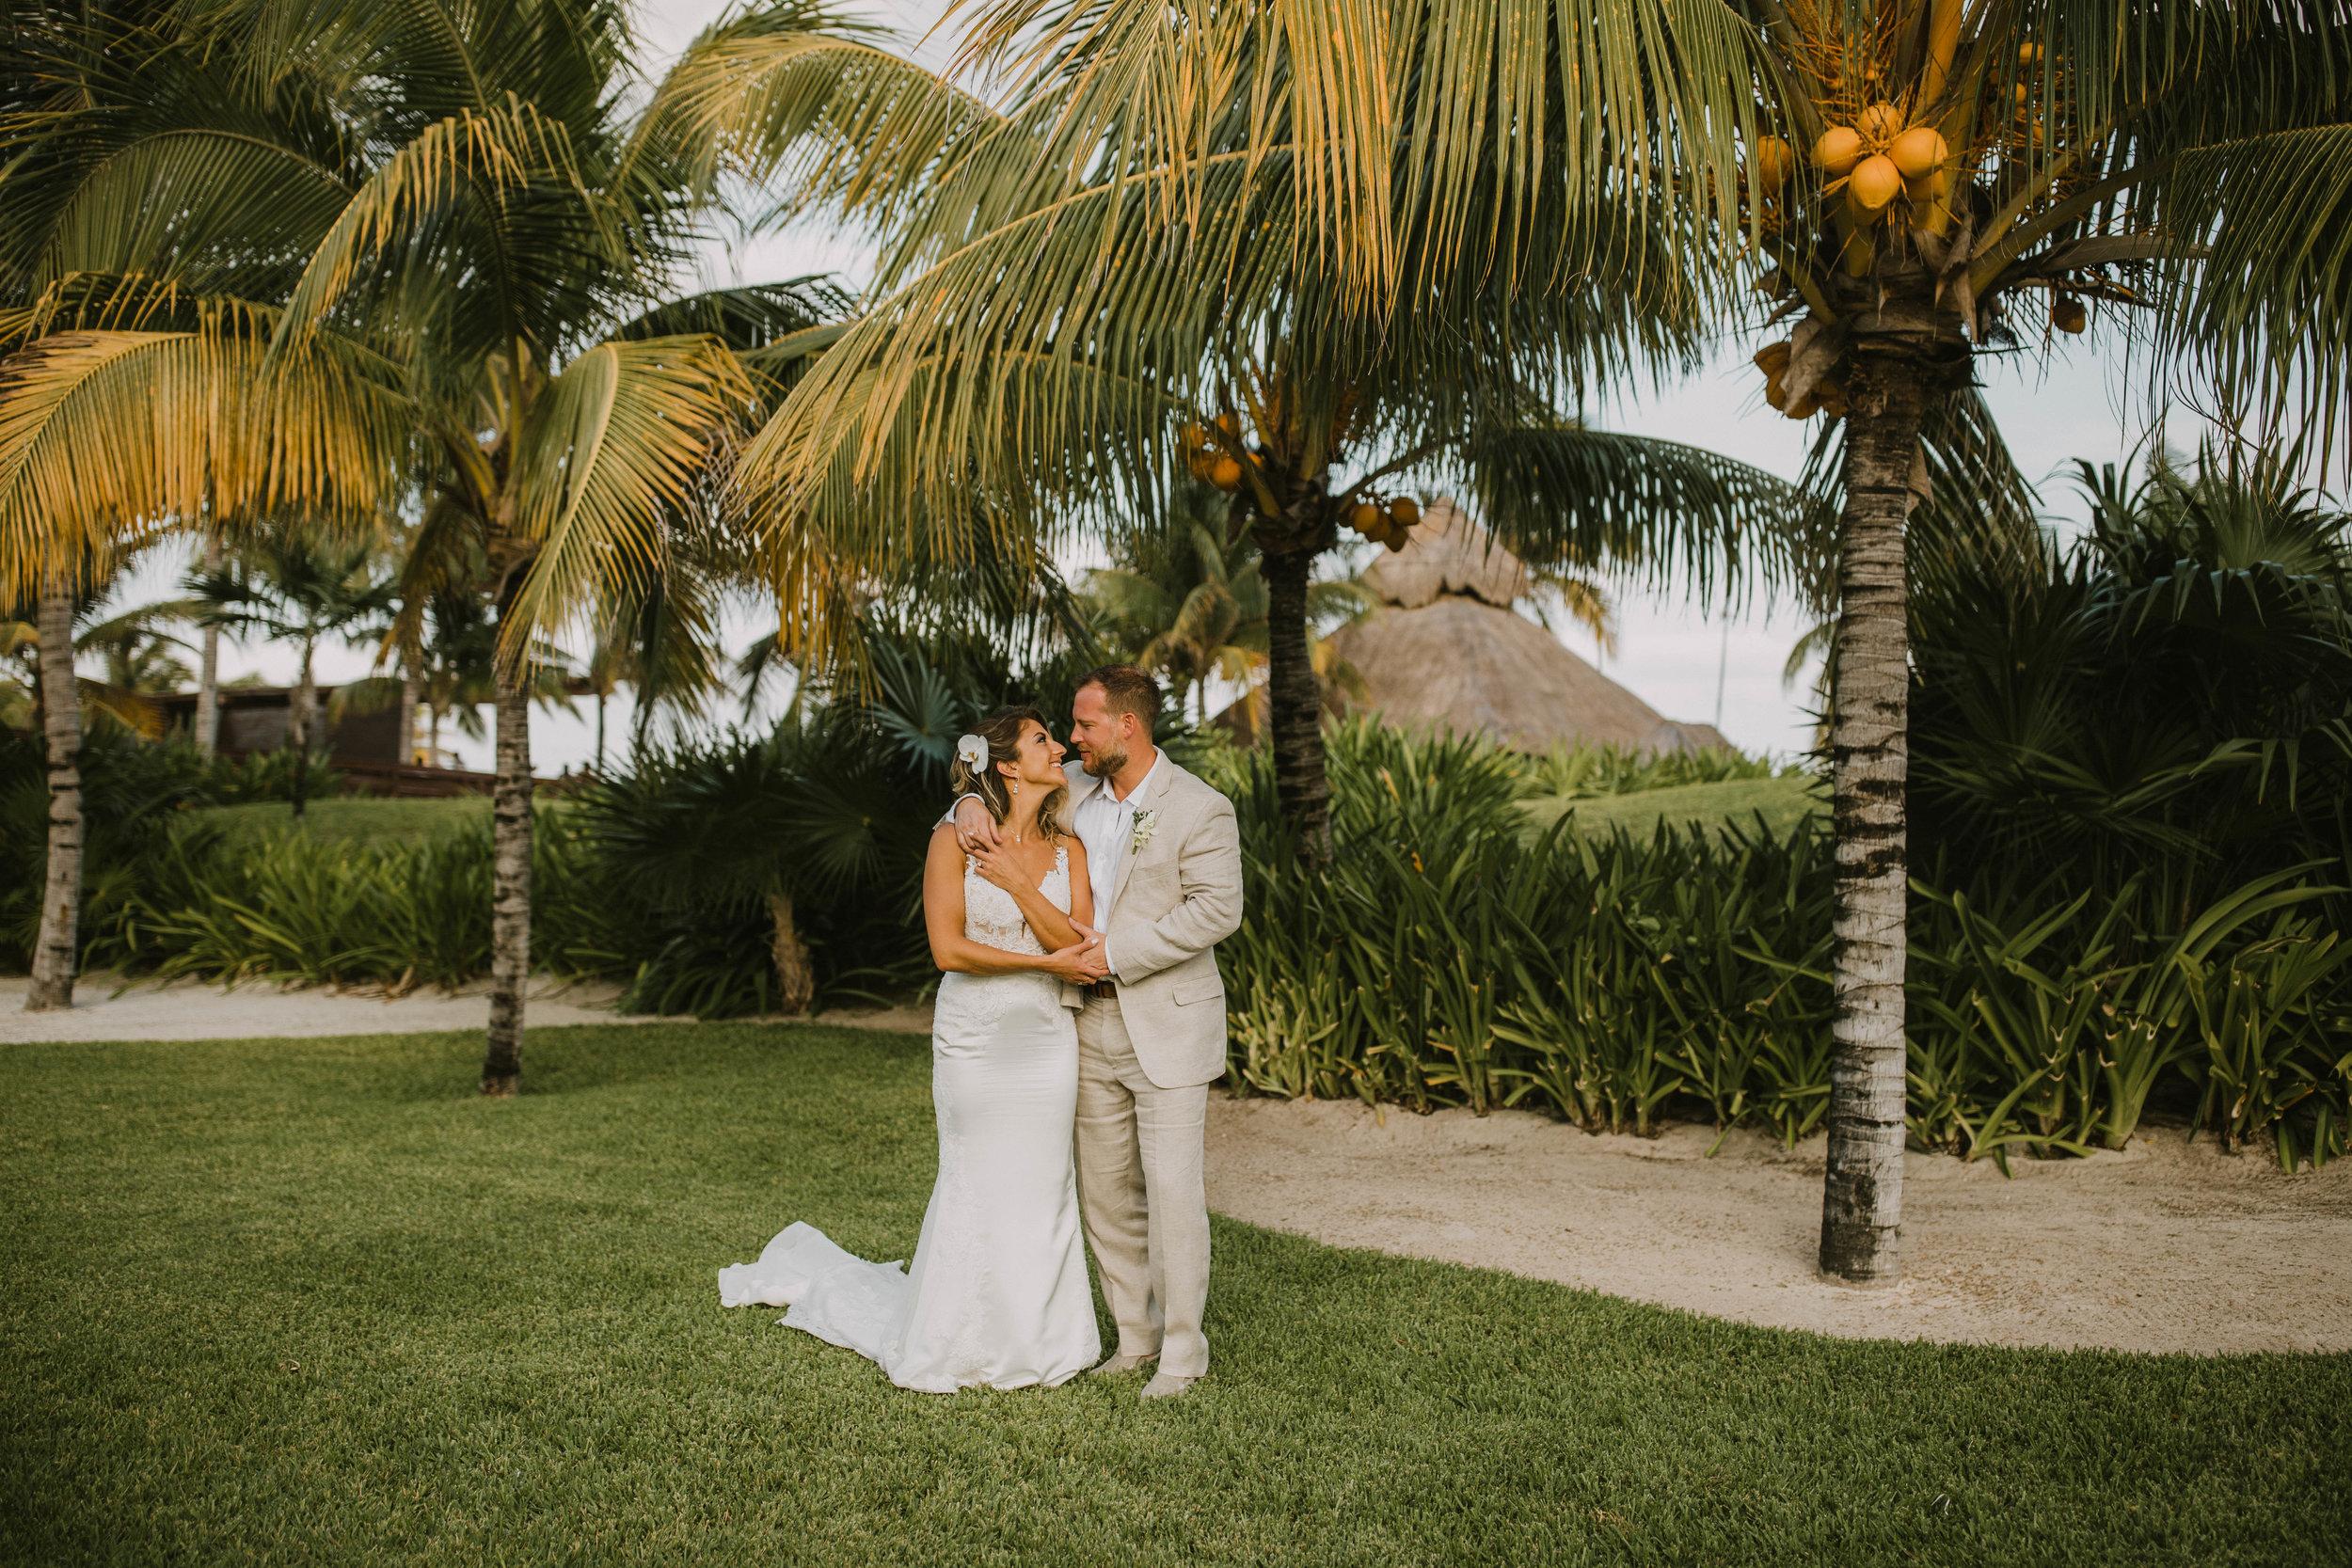 E&J-Destination Wedding Photographer Videographer-460.jpg